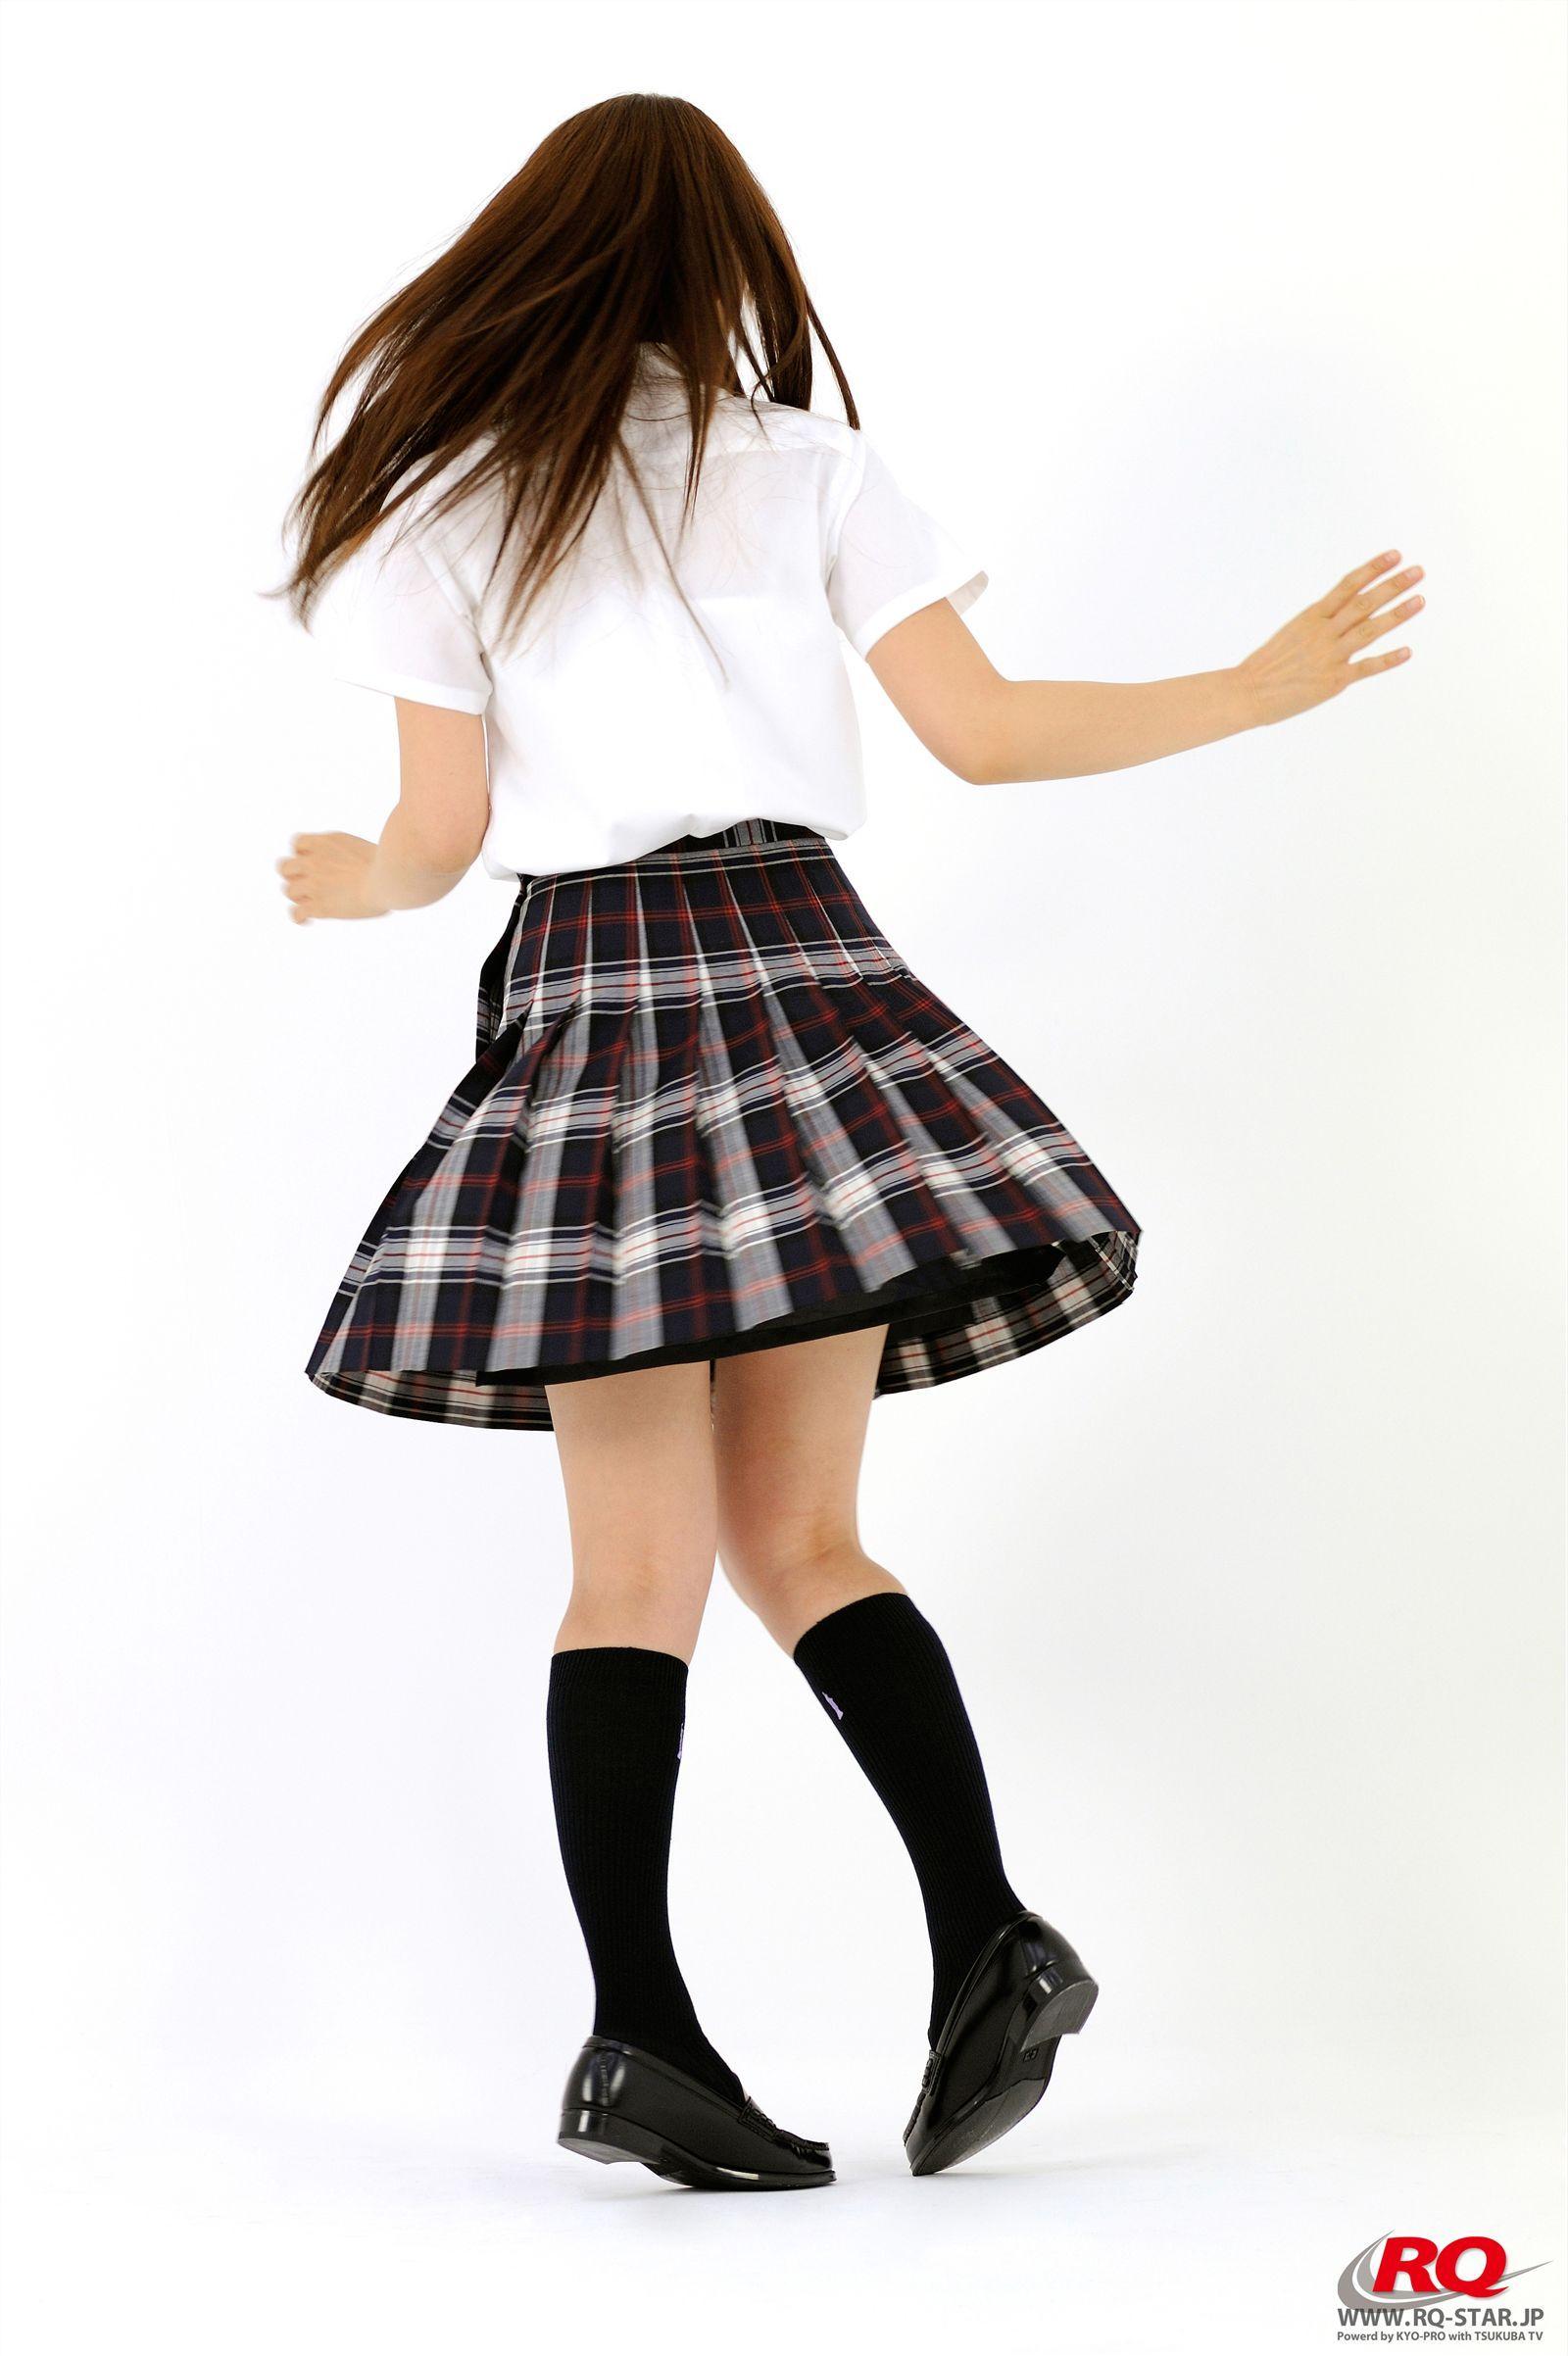 [RQ STAR美女] NO.01148 Rena Sawai 澤井玲菜 Student Style[40P] RQ STAR 第1张